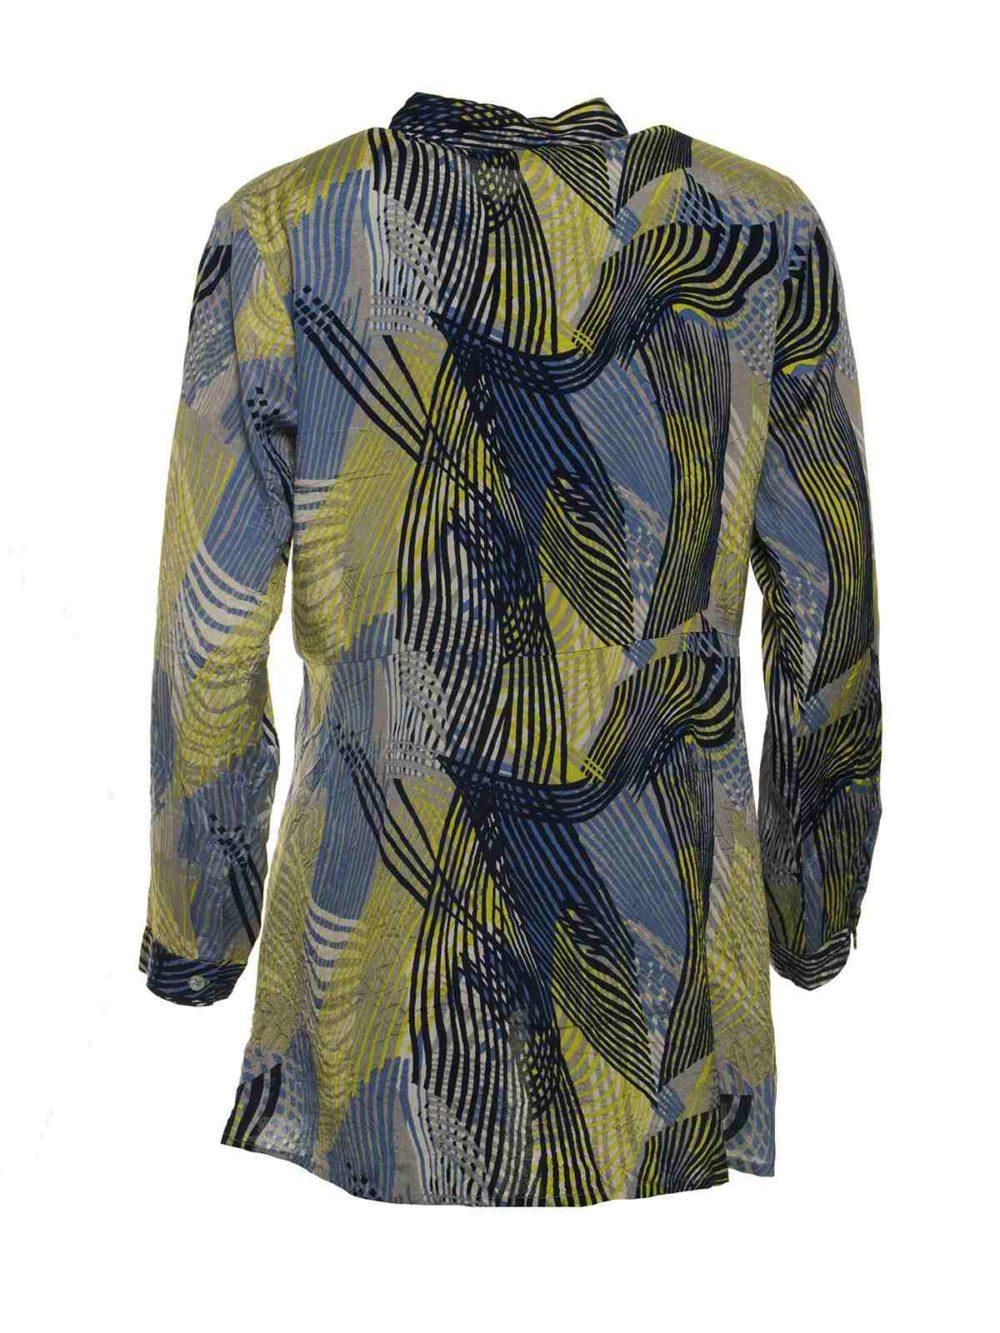 Ita Blouse Masai Clothing Katie Kerr Women's Clothing